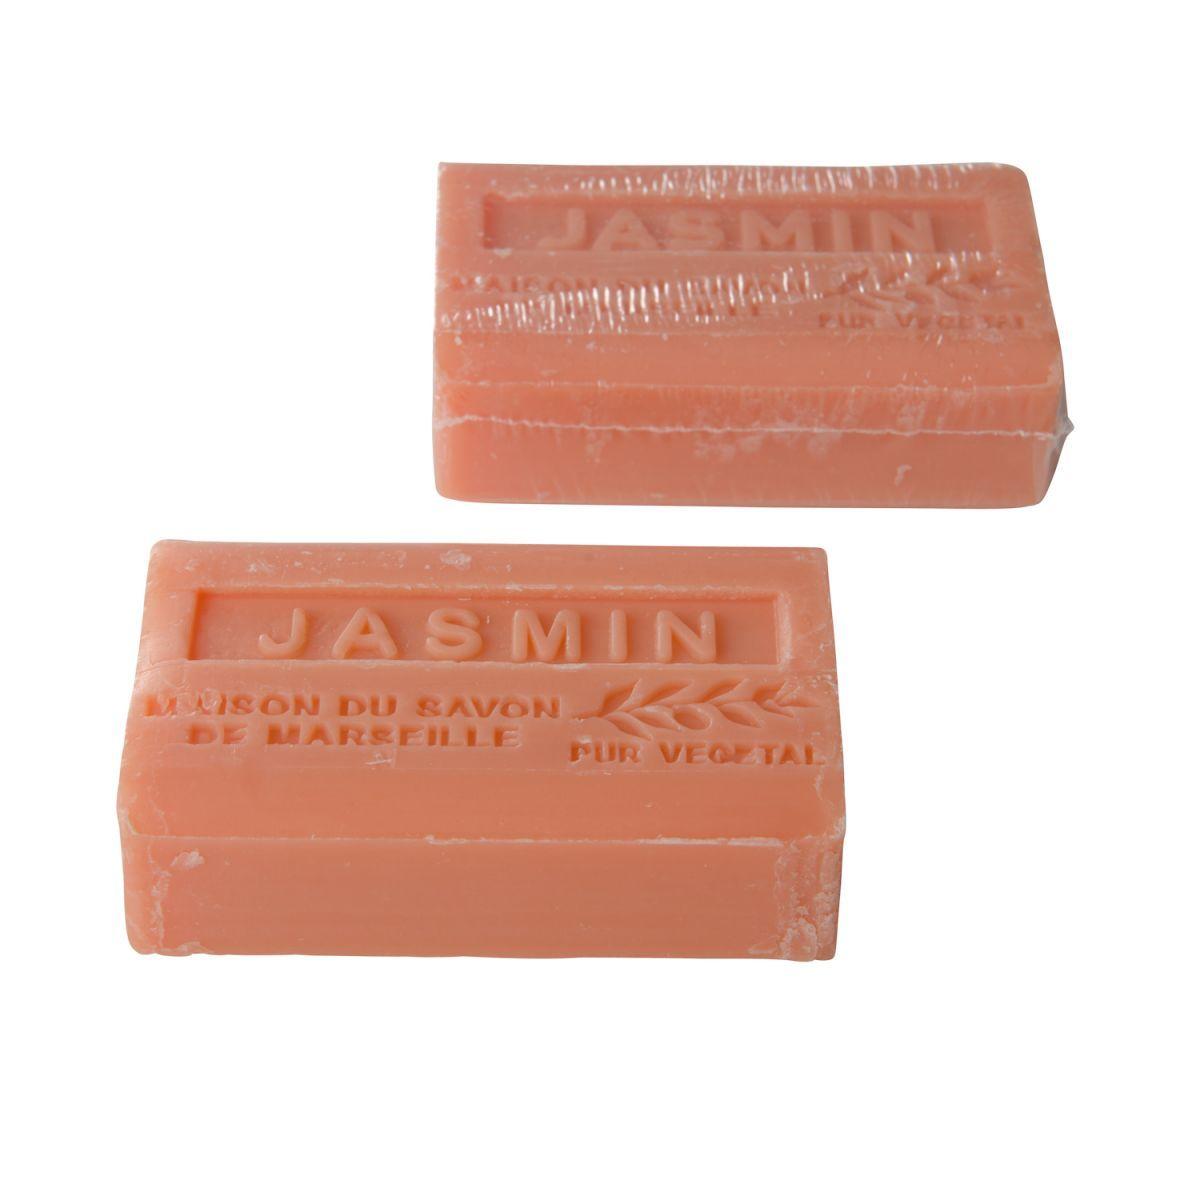 handzeep marseille 125 gr jasmin box12